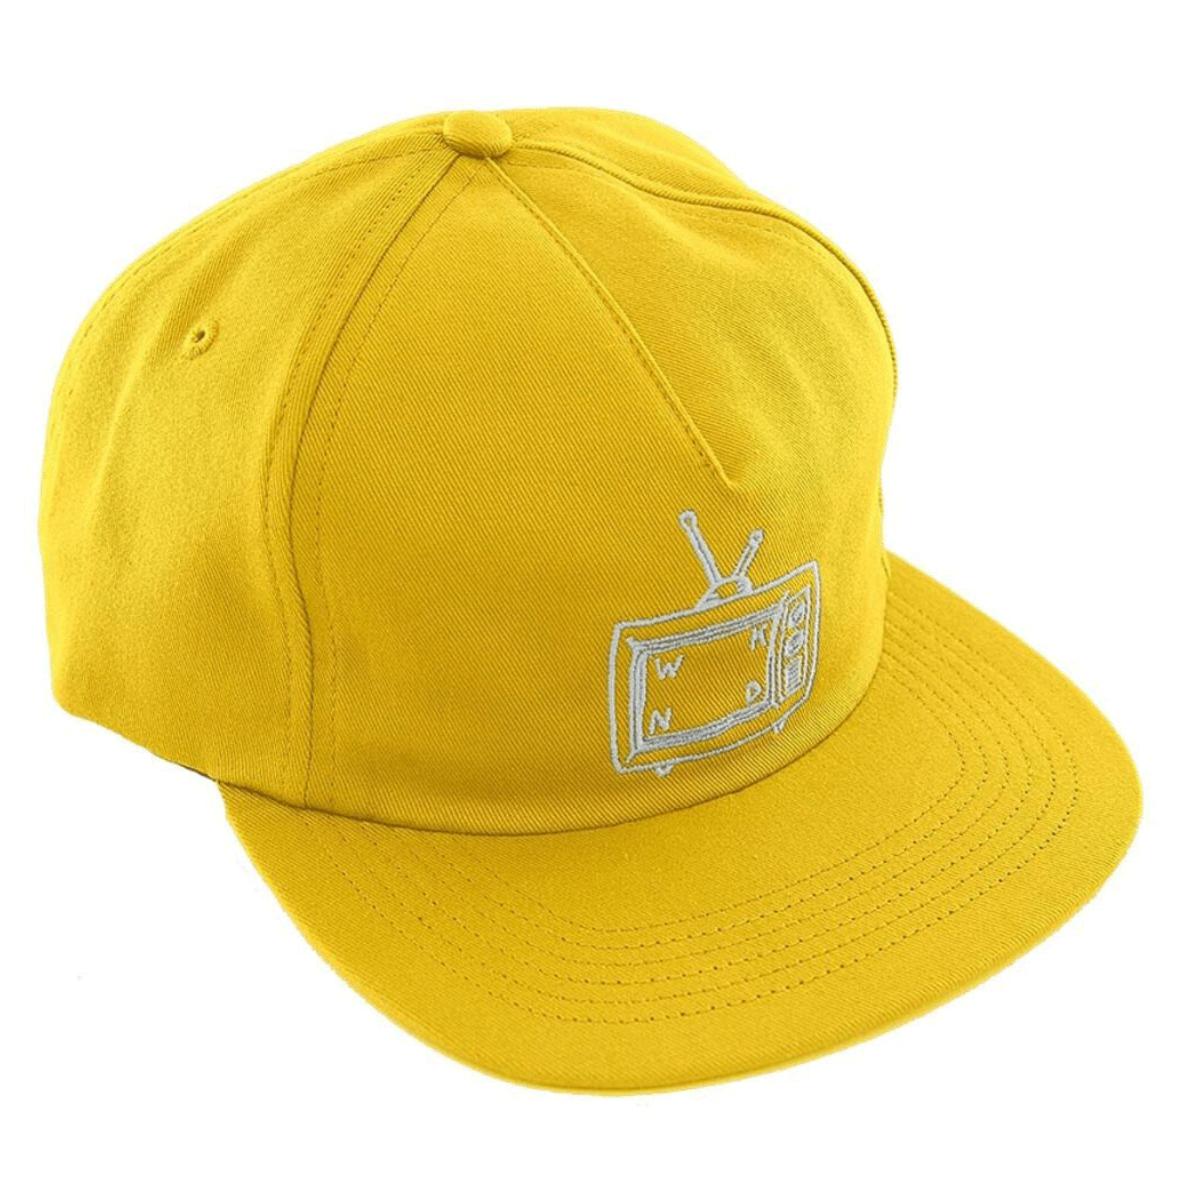 WKND TV Logo Yellow Cap